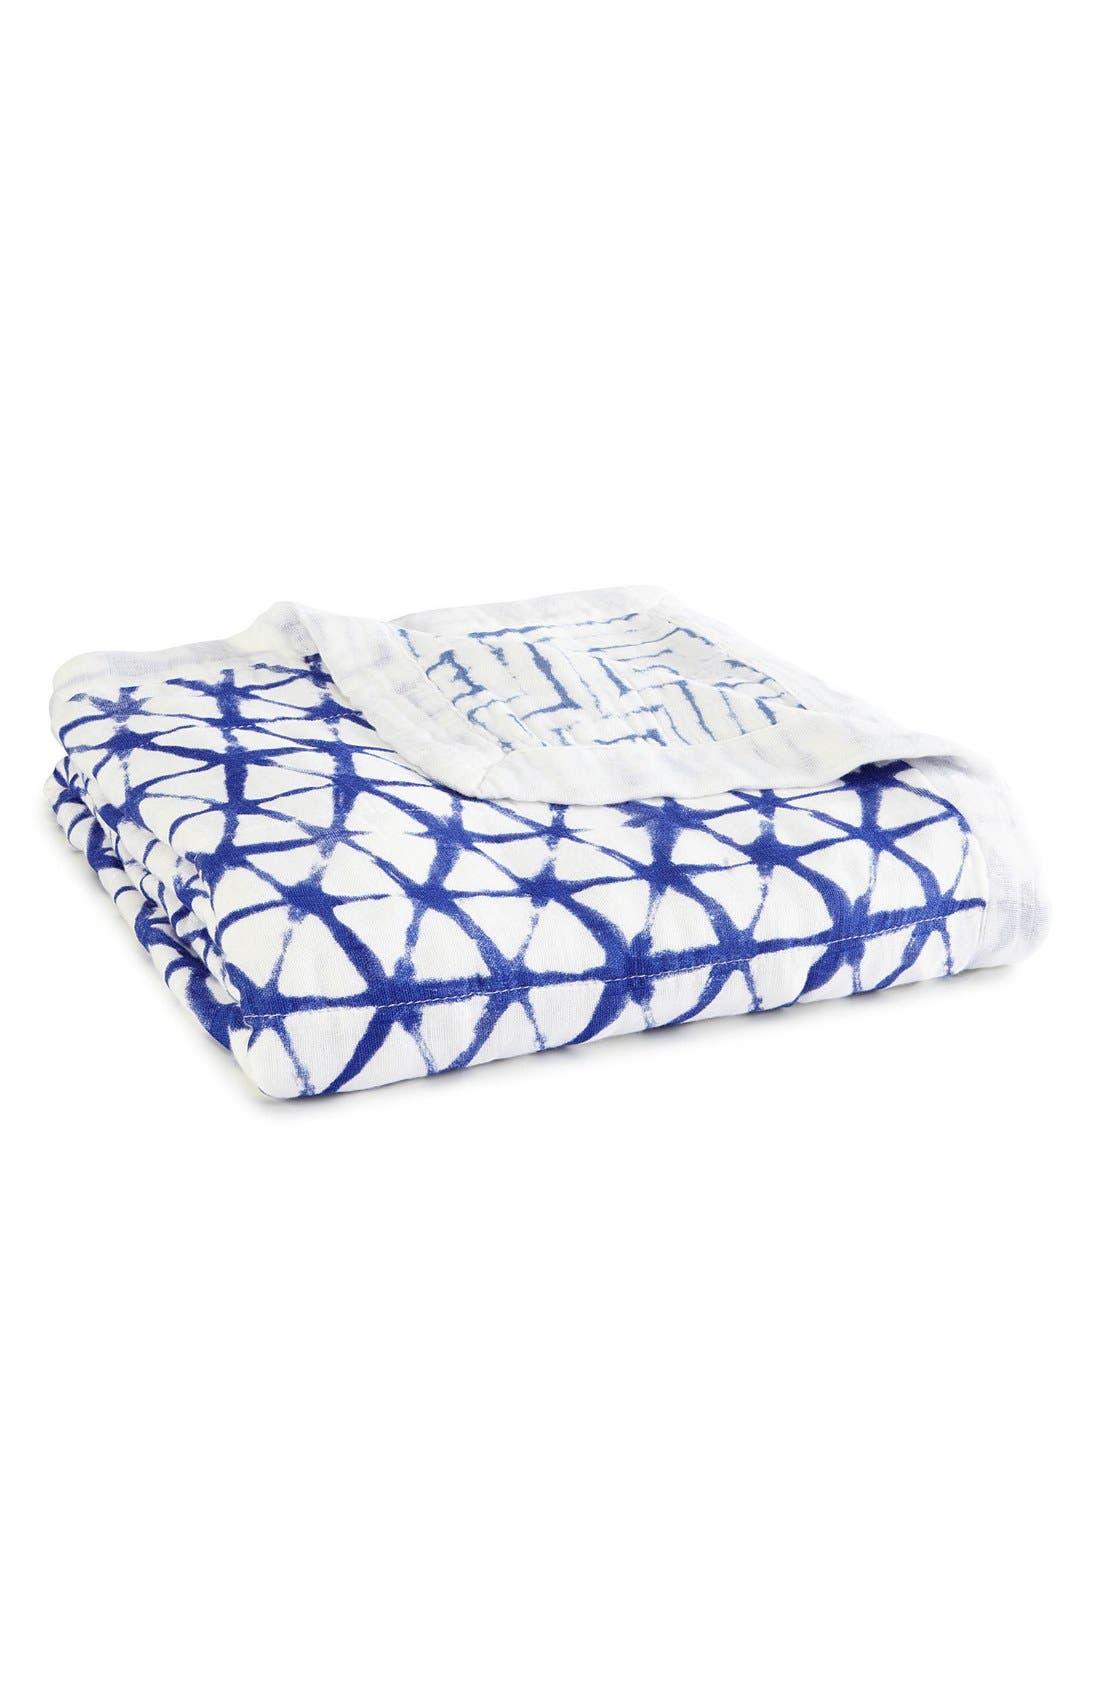 'Silky Soft Dream' Blanket,                         Main,                         color, BLUE